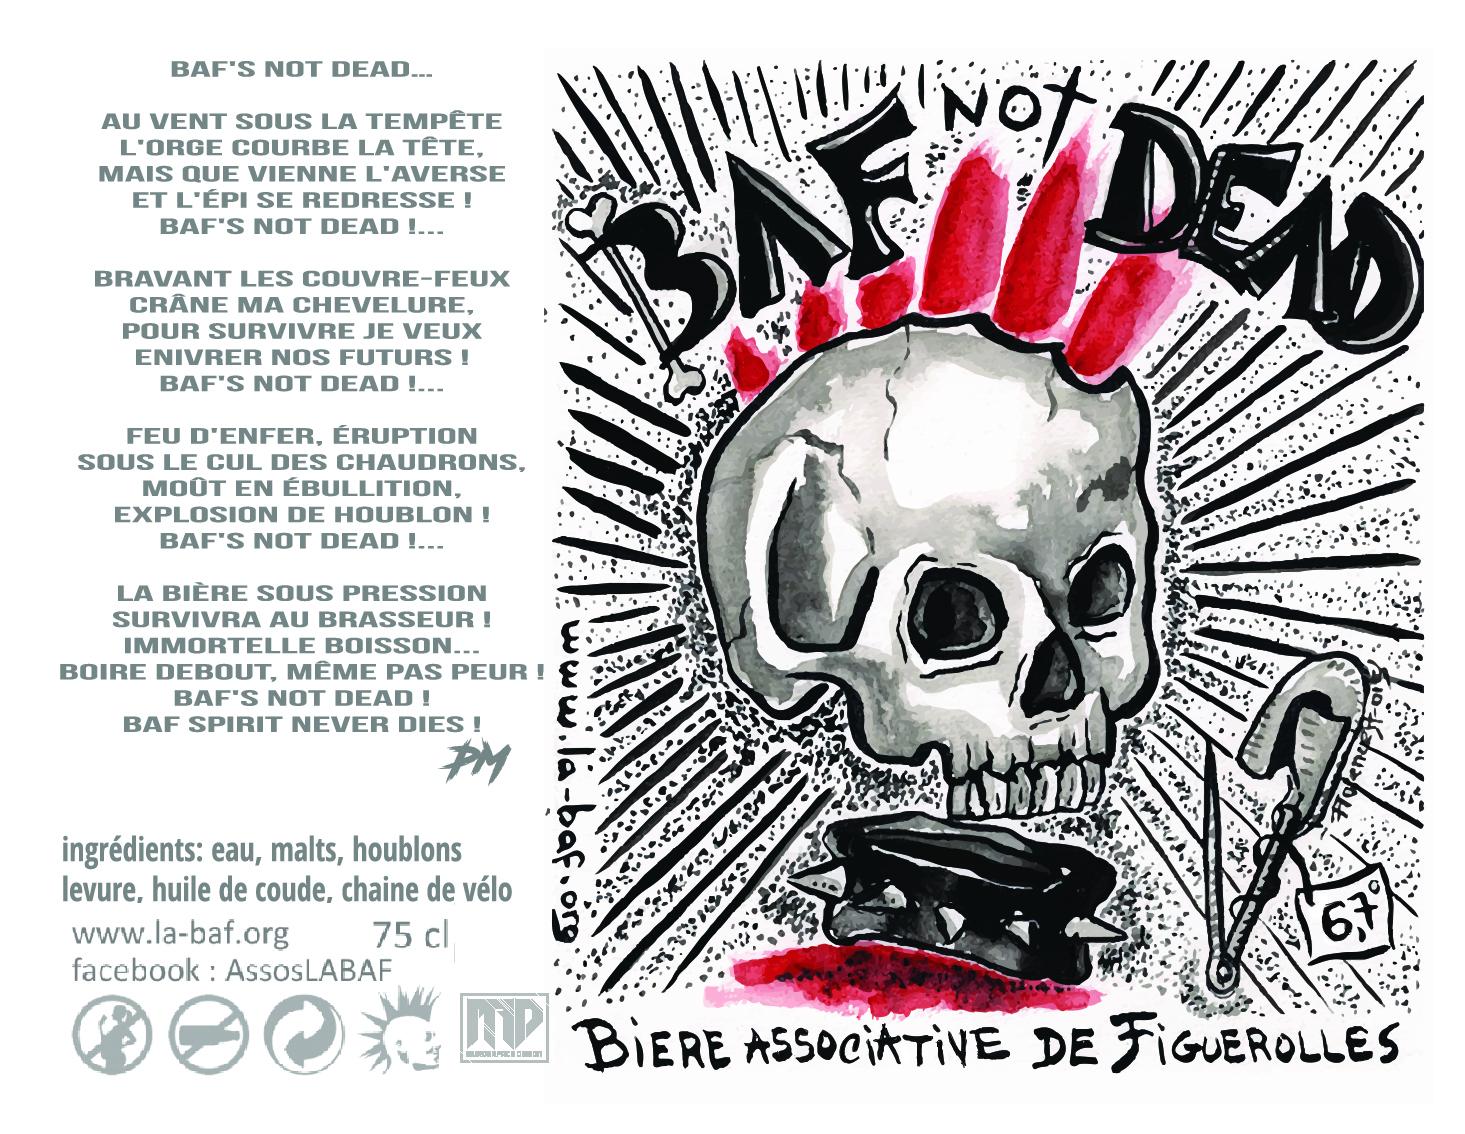 BAF not DEAD #8